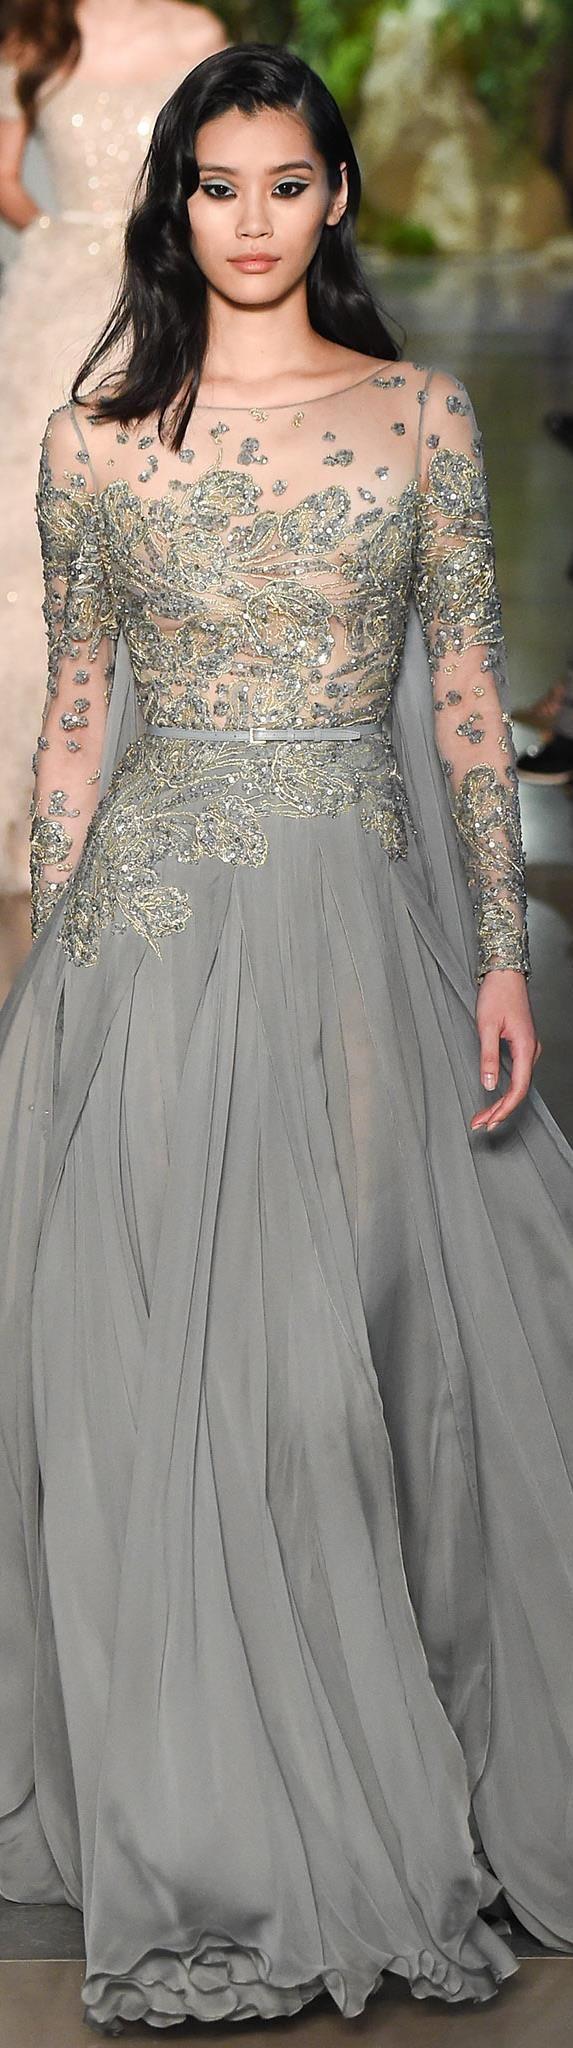 TD ❤️ Spring 2015 Couture Elie Saab Model Ming Xi (Elite)